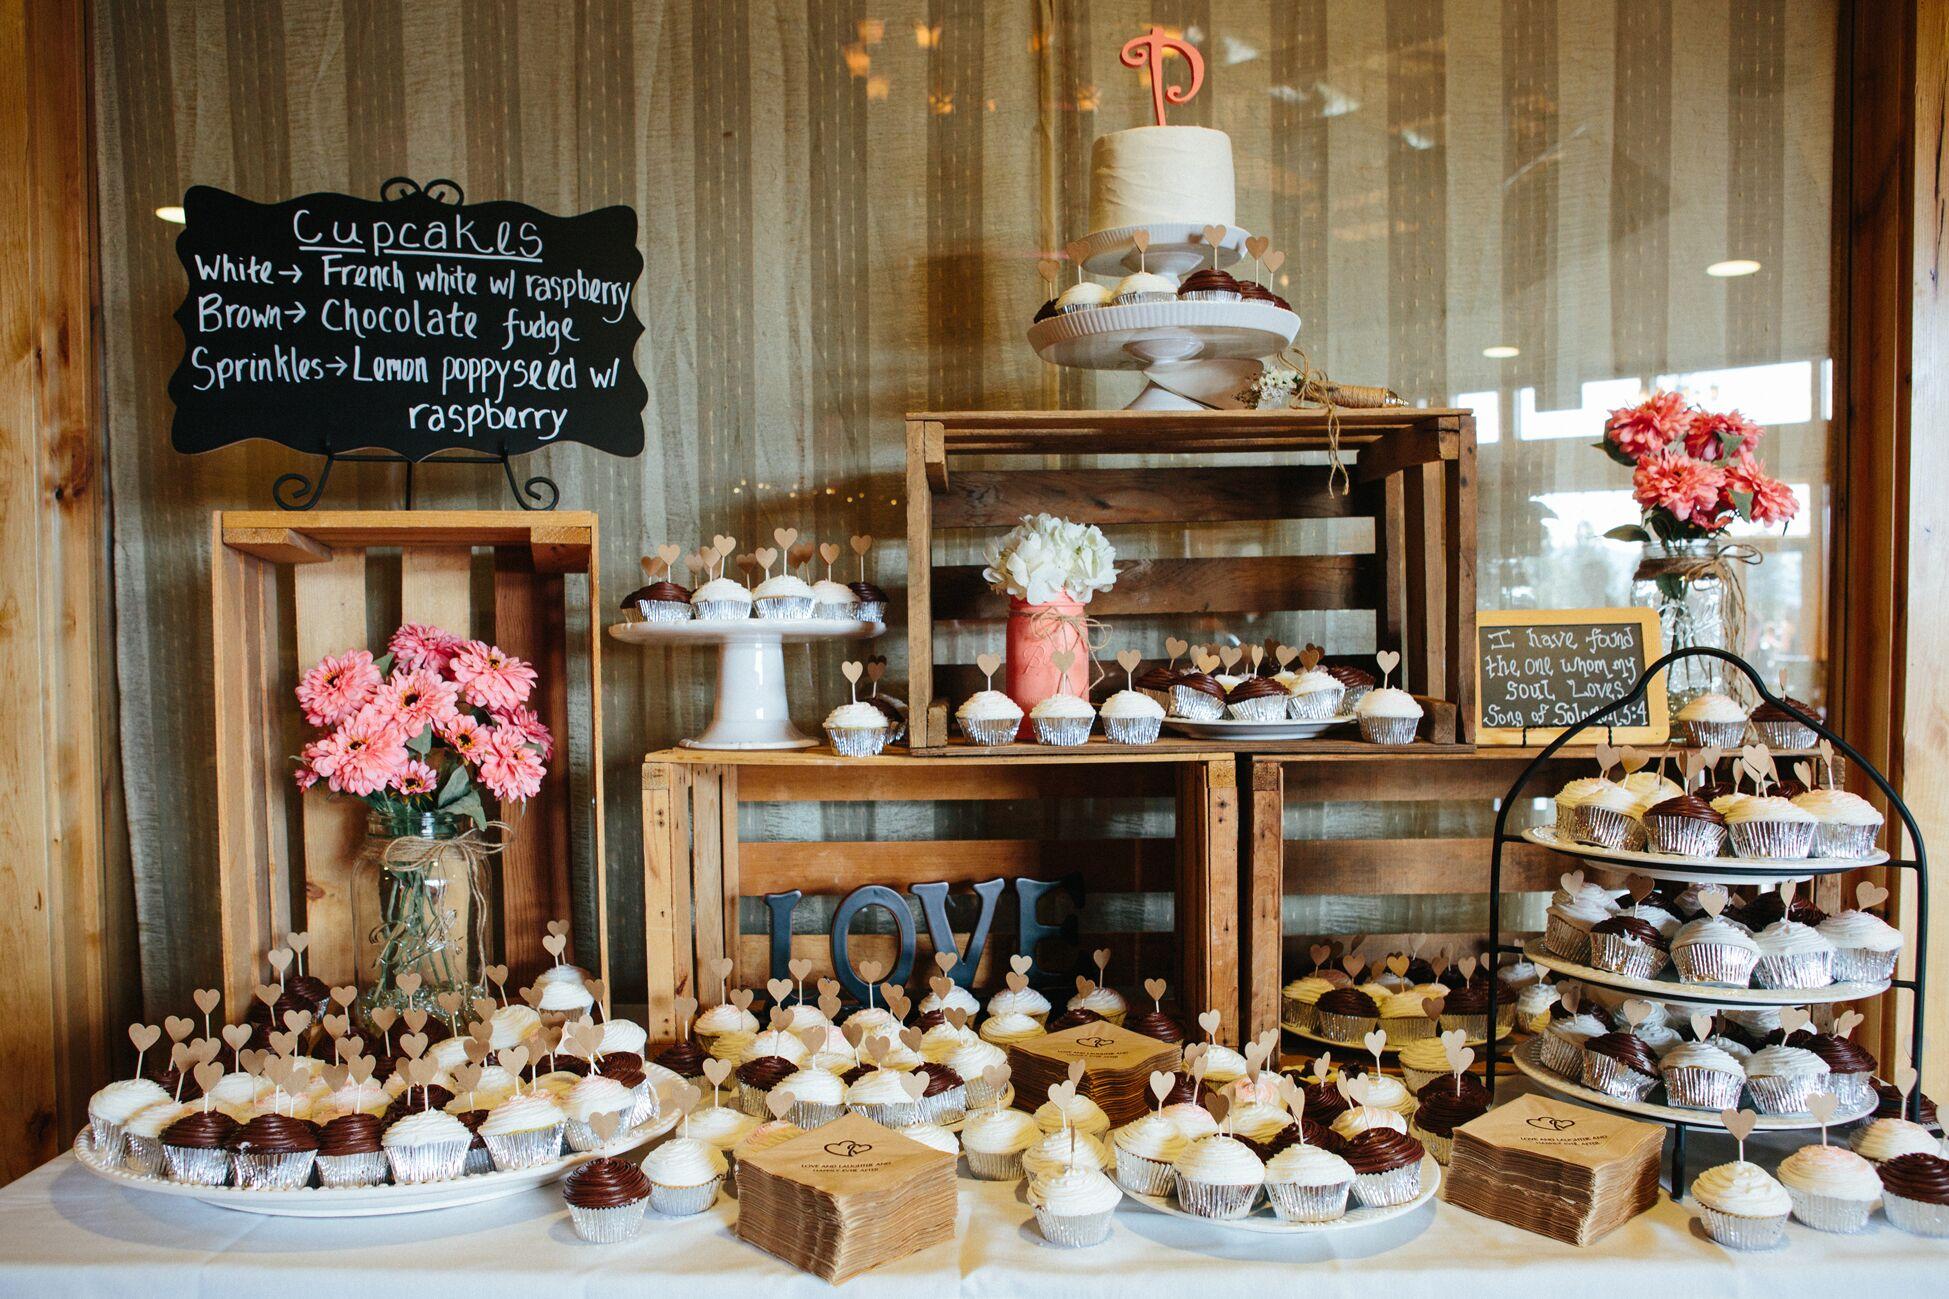 Rustic Dessert Bar Display